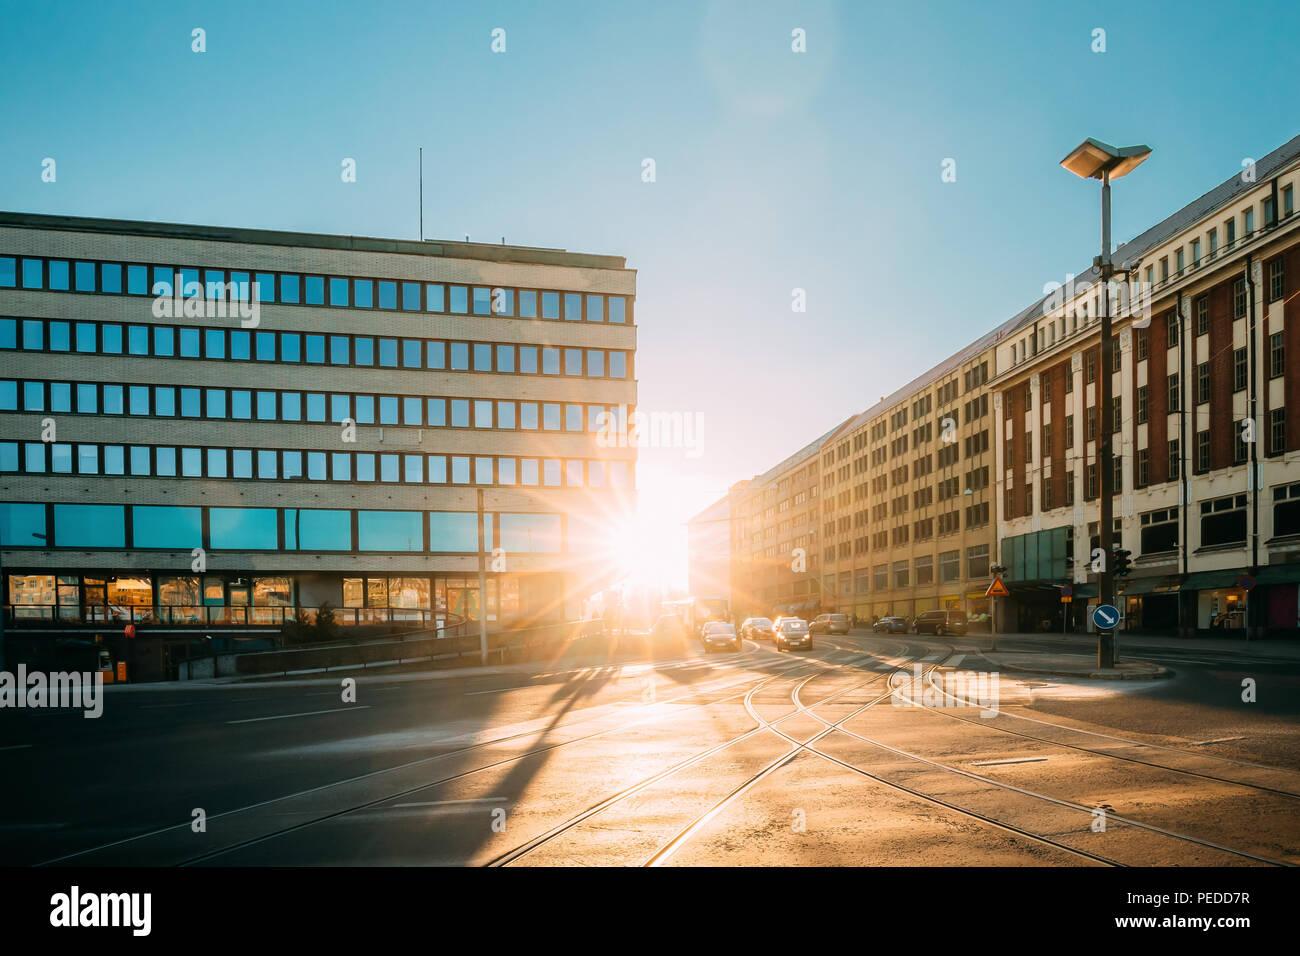 Helsinki, Finland - December 11, 2016: View Of Siltasaarenkatu Street. Moving Cars In Sunlight Of Sunset Sunrise - Stock Image